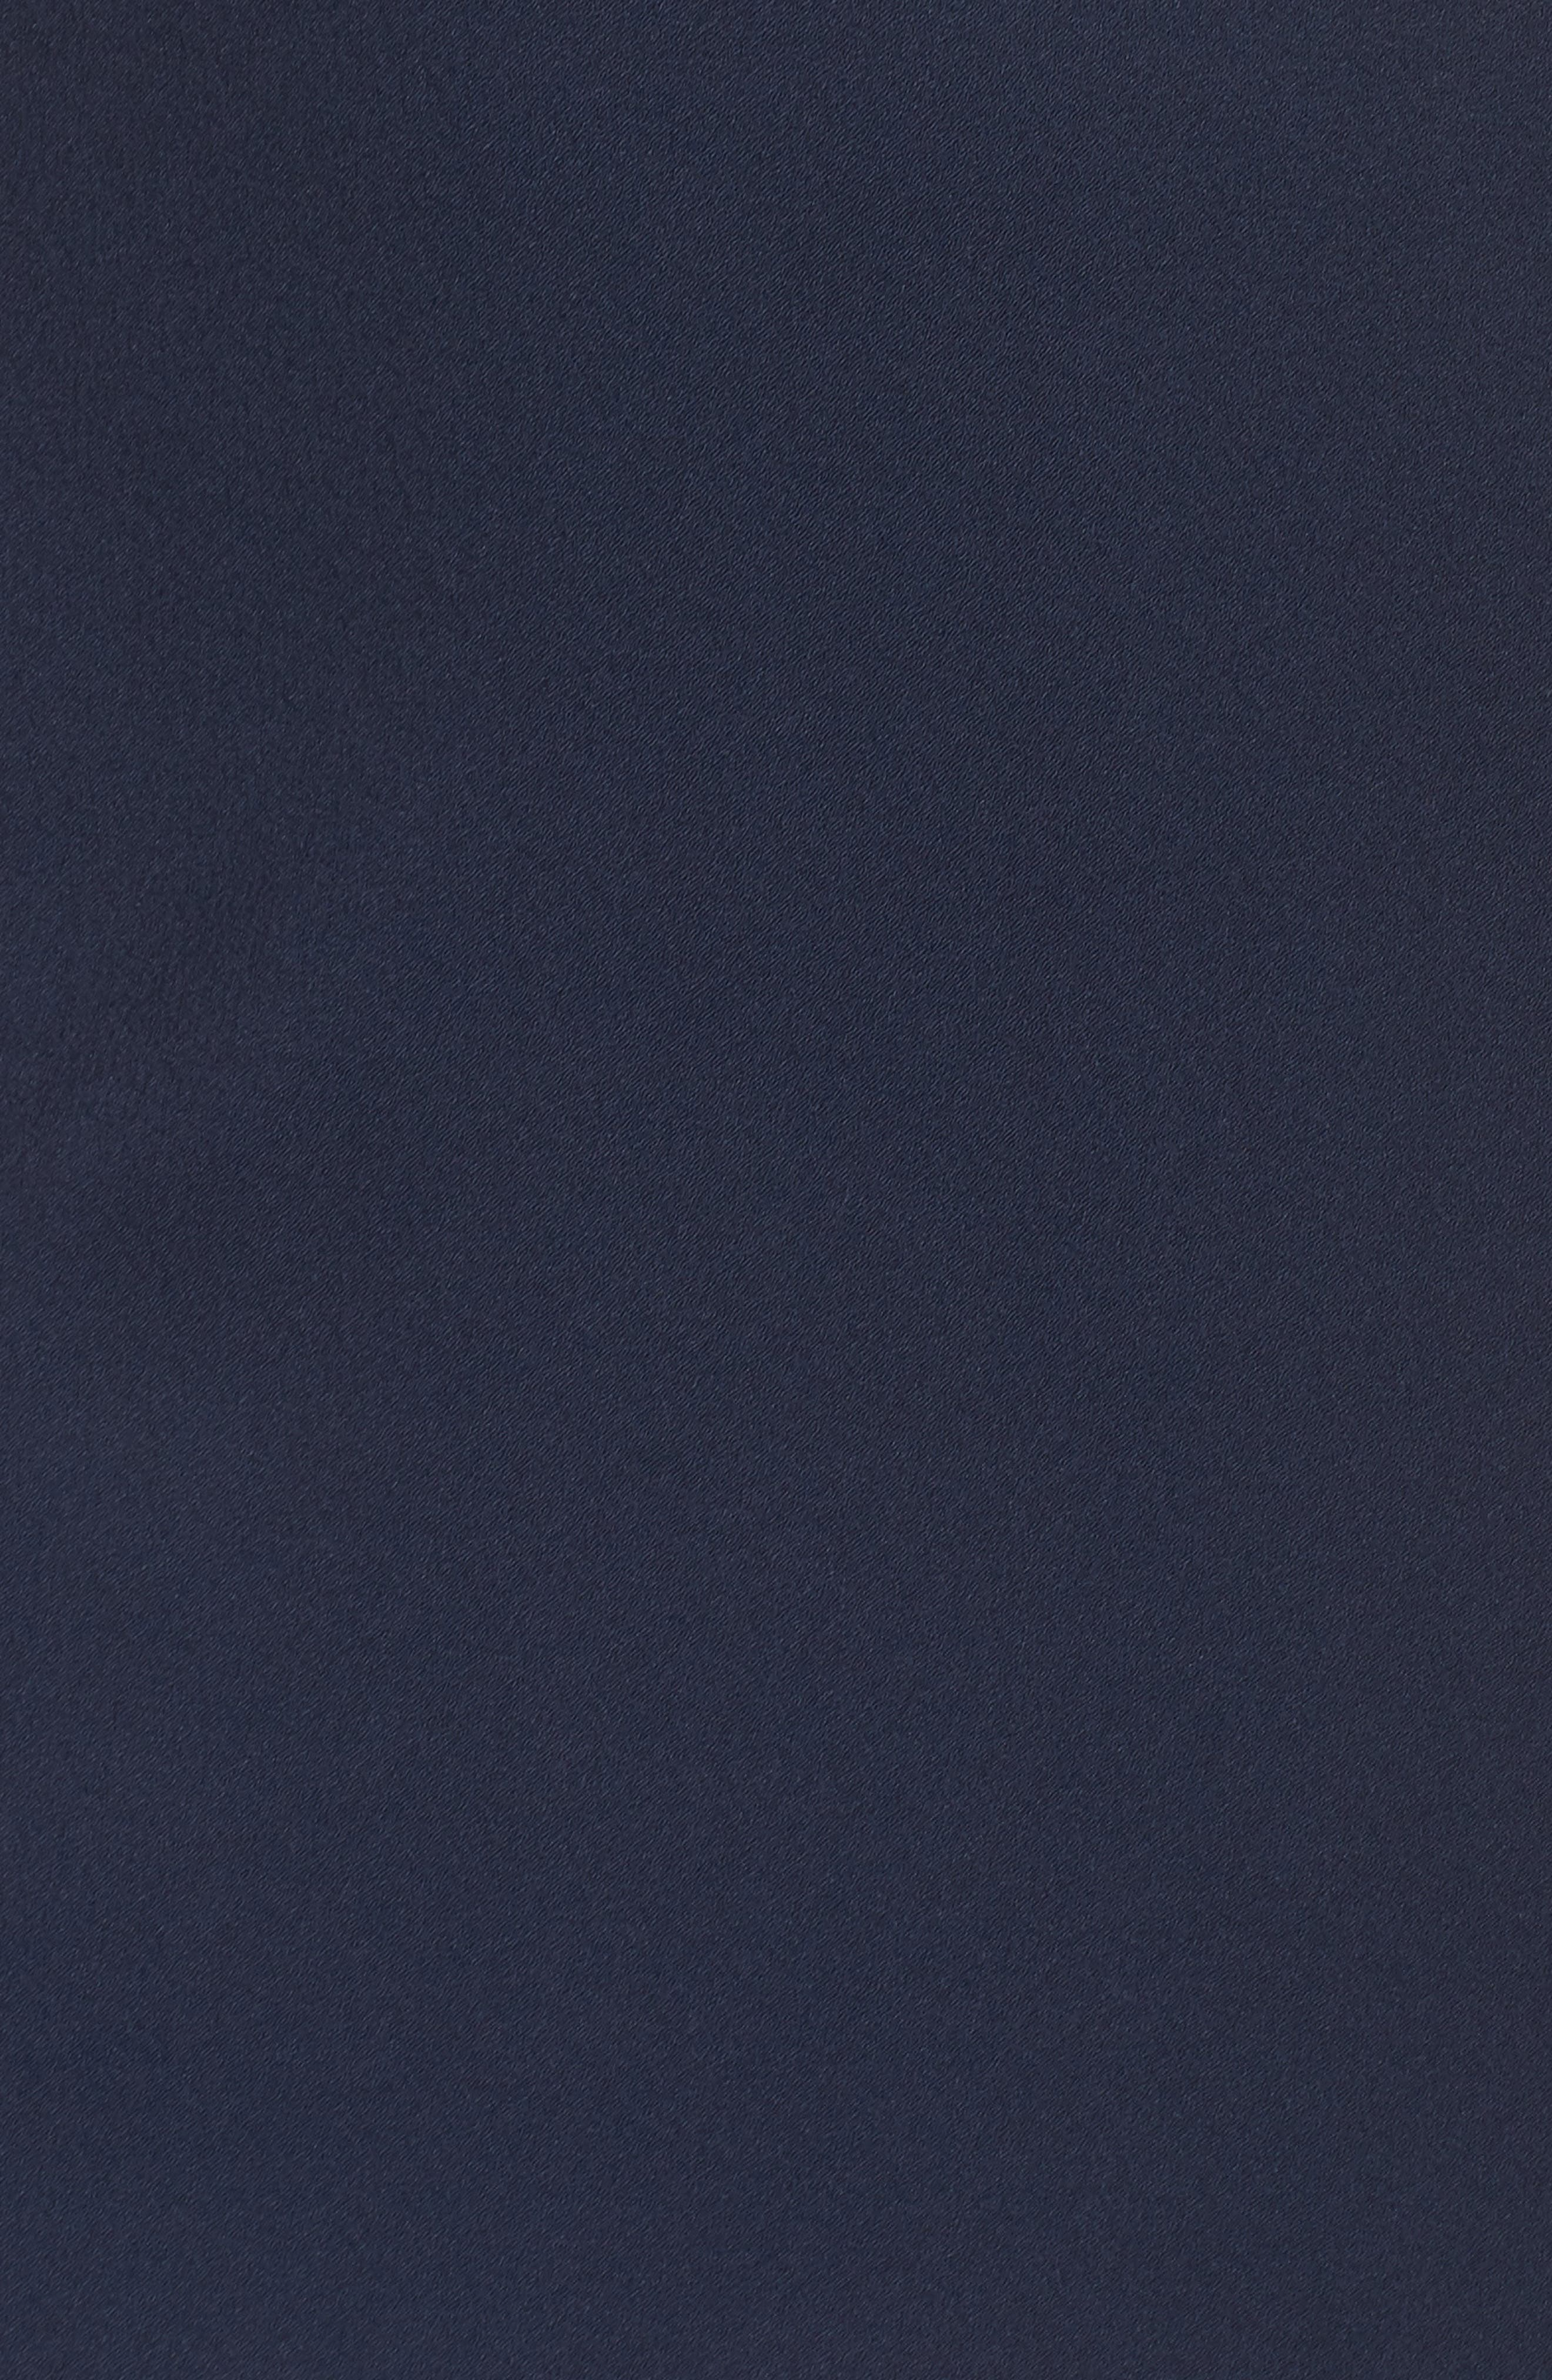 Cold Shoulder Satin Trim Dress,                             Alternate thumbnail 6, color,                             Navy